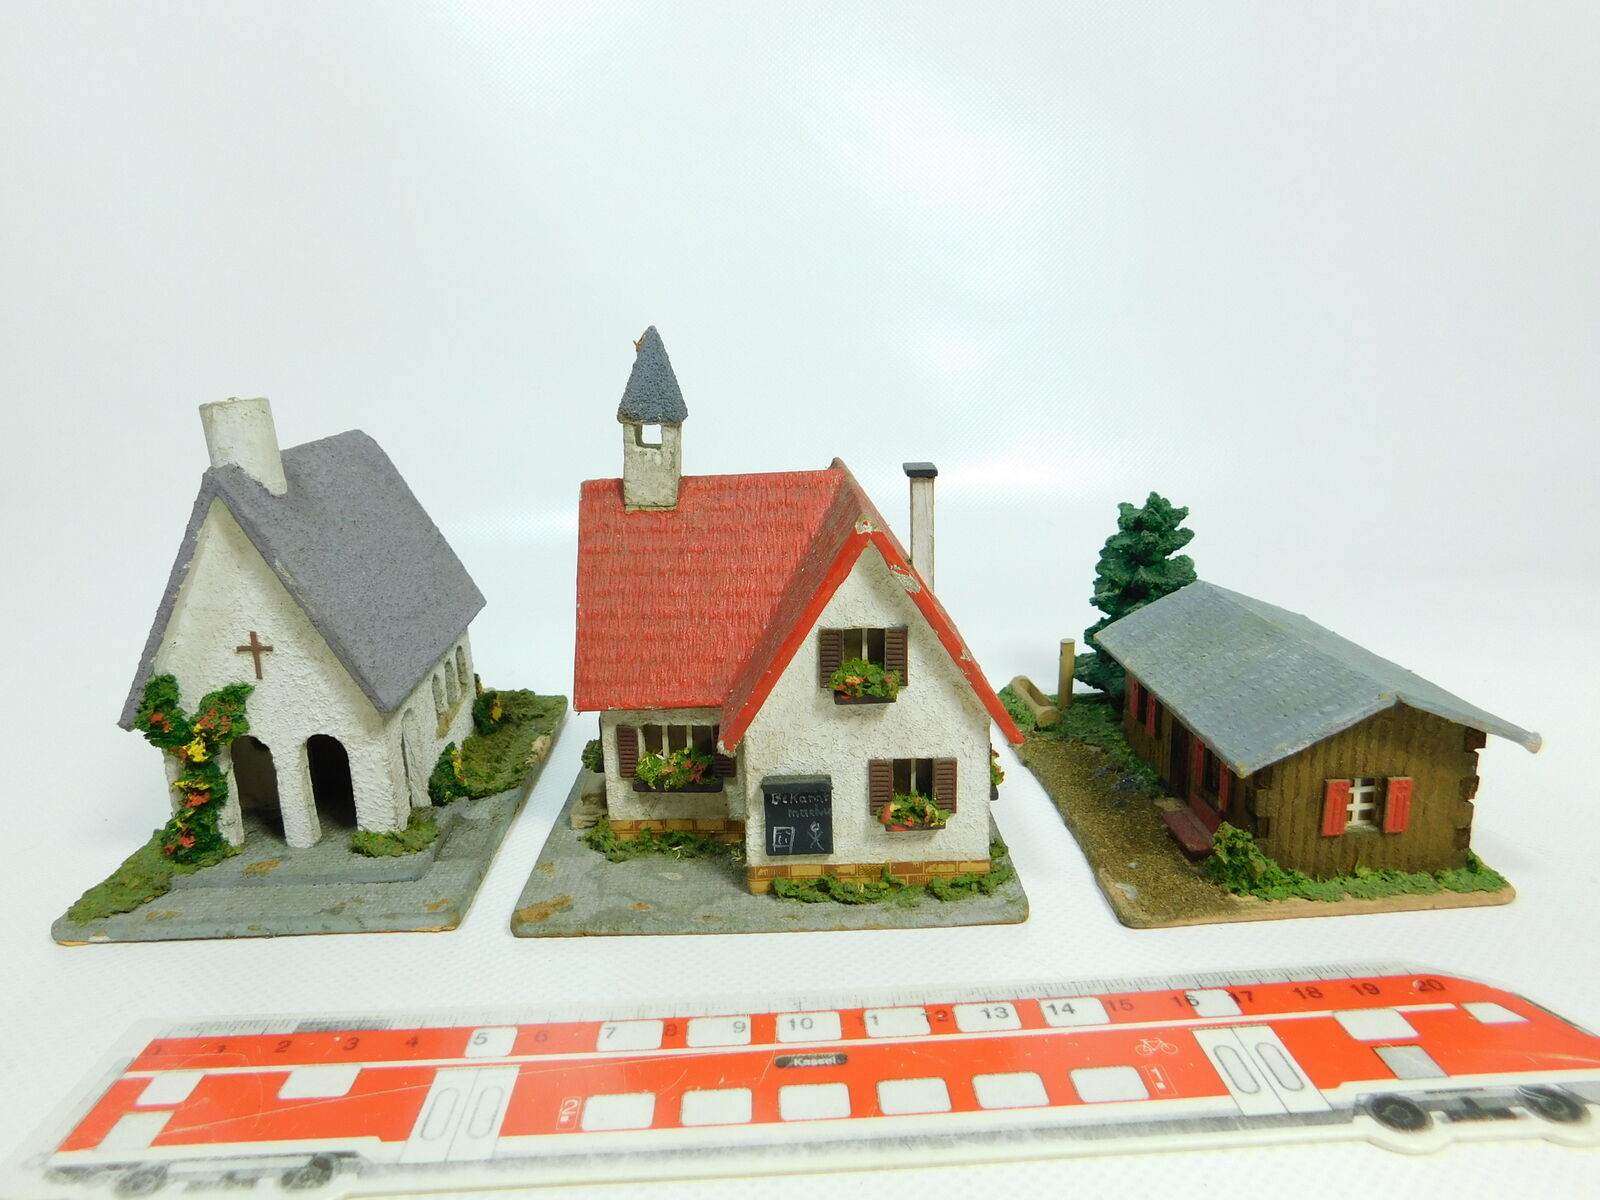 BH375 -1 x Holz -modellllerlerle H0  00 Church, City Hall Mountain Hut 6468 R